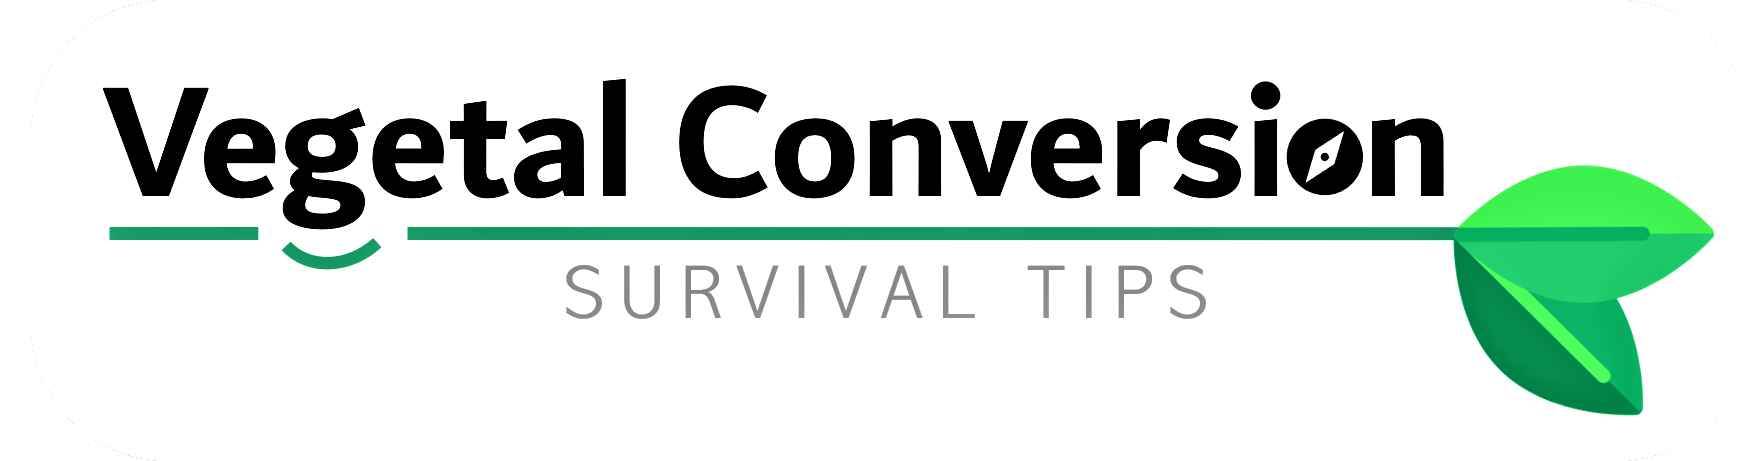 VEGETAL CONVERSION